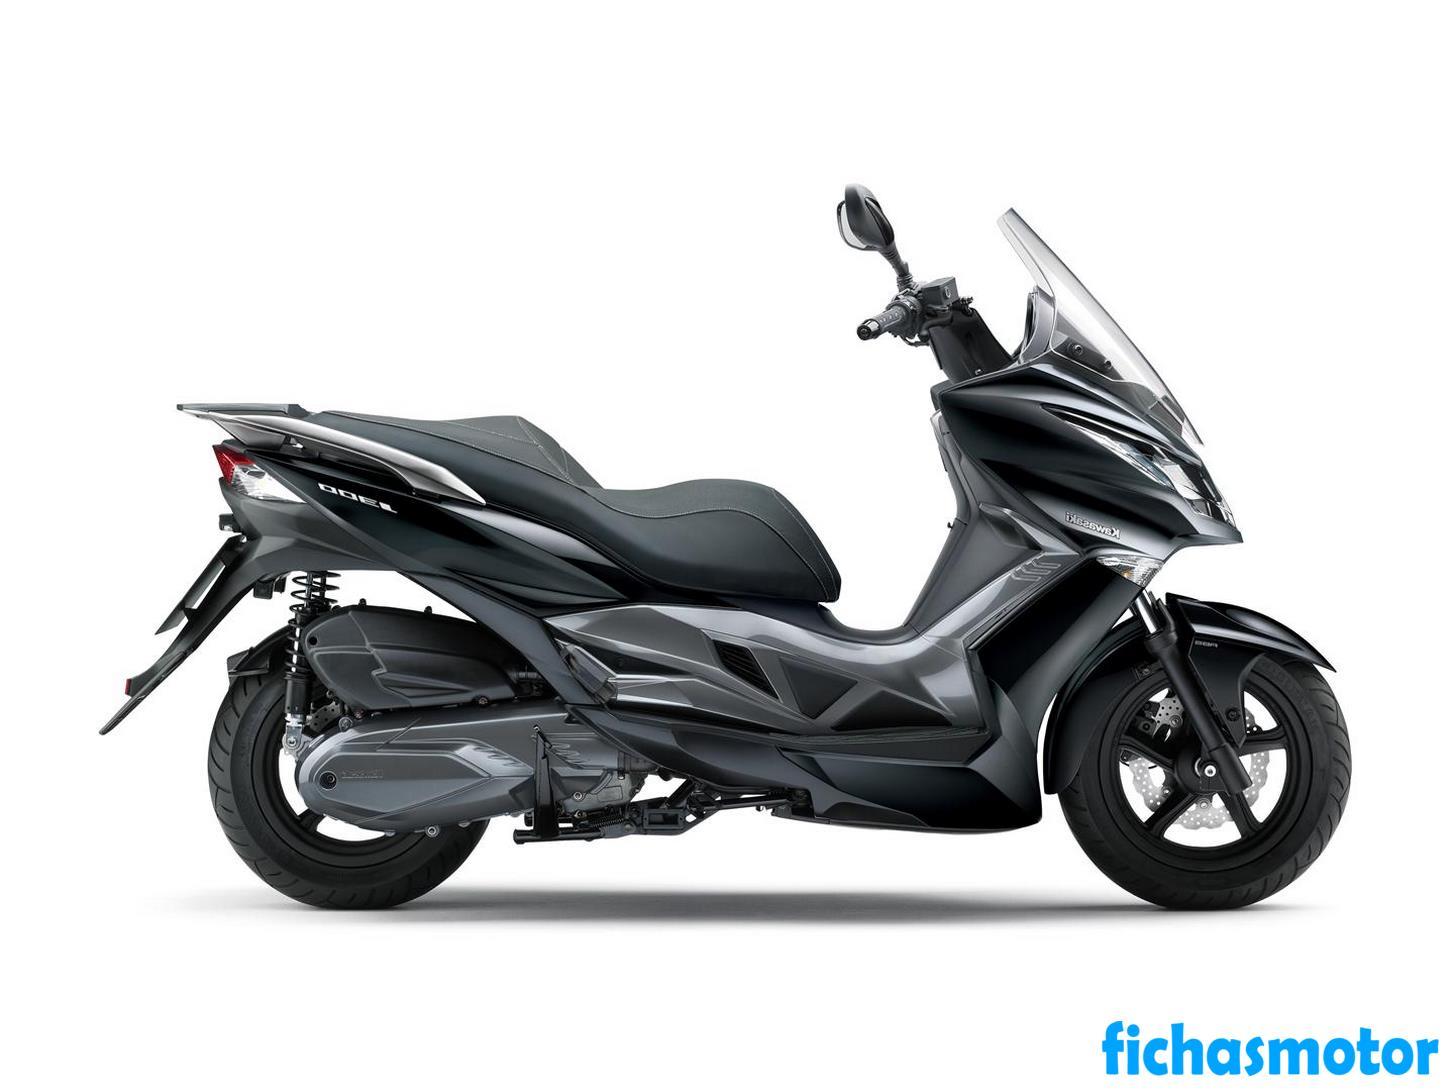 Imagen moto Kawasaki J300 año 2020